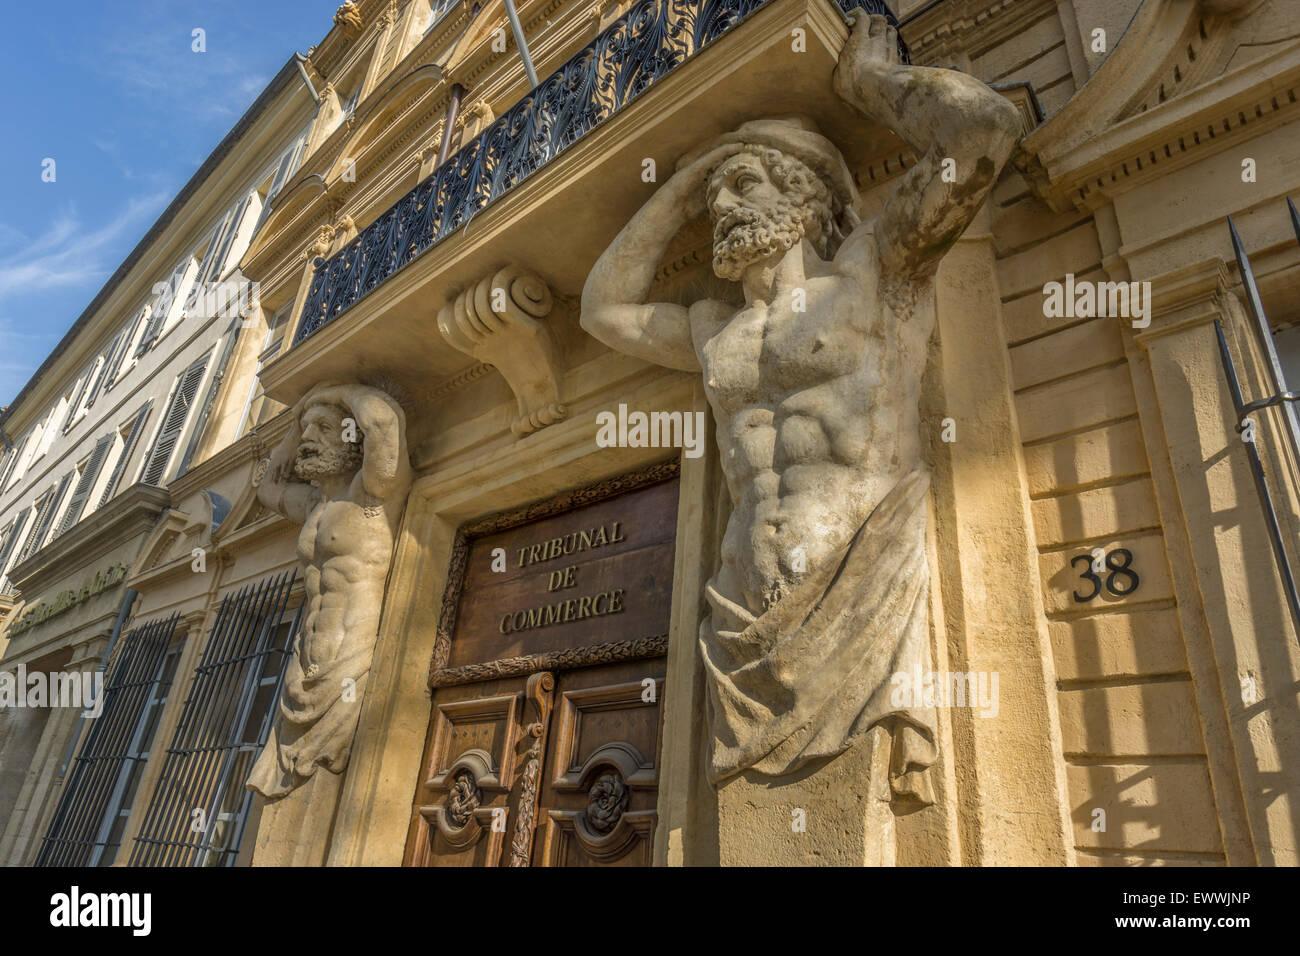 Dorway with caryatids tribunal de commerce atlas figures - Tribunal de commerce de salon de provence ...